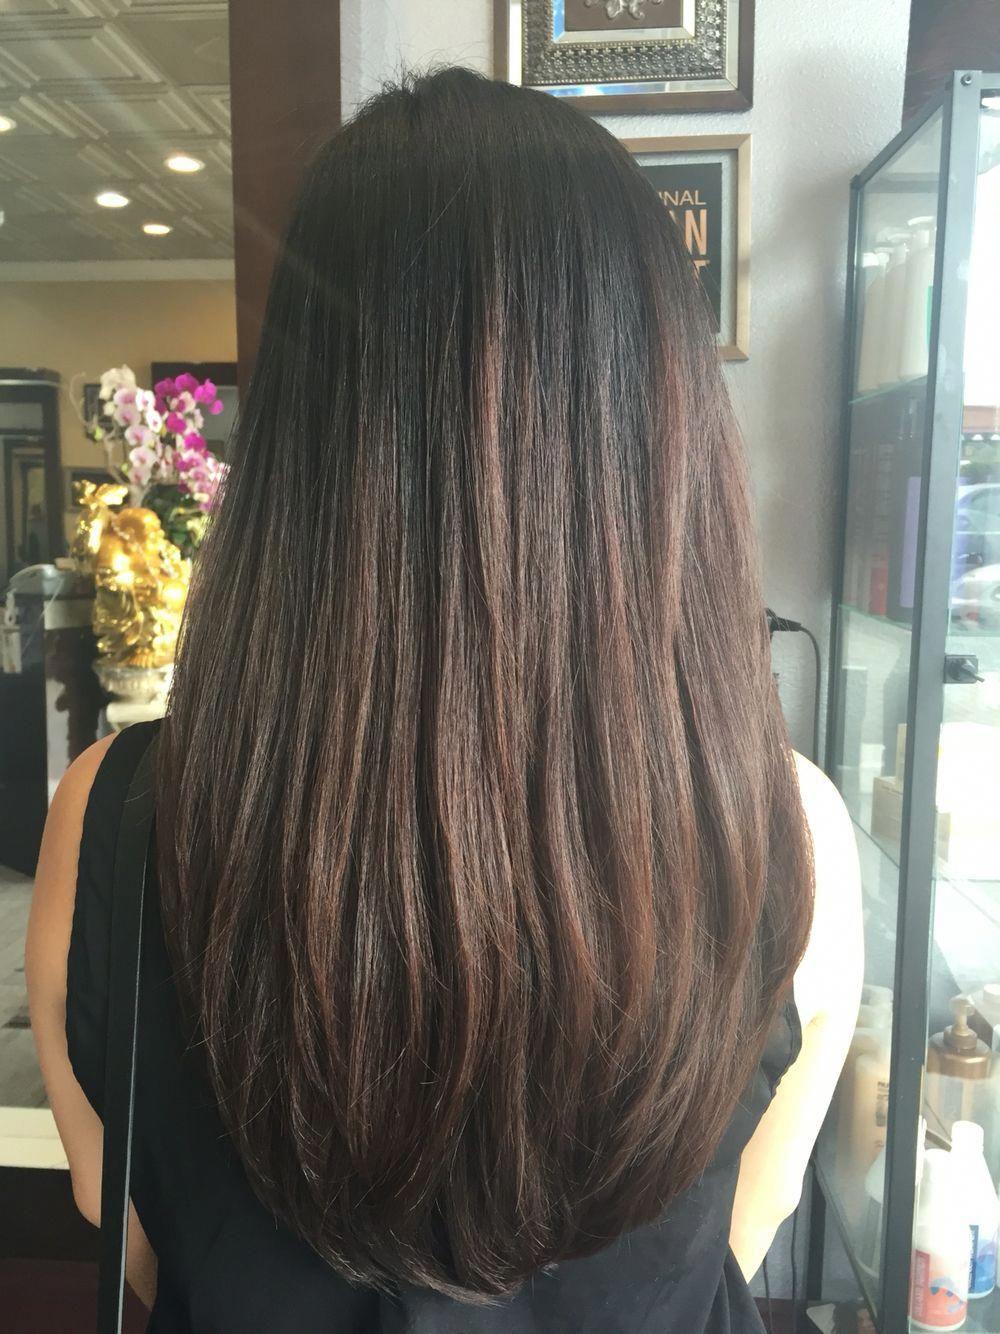 Pin on =X> Stylish Long Hairstyles